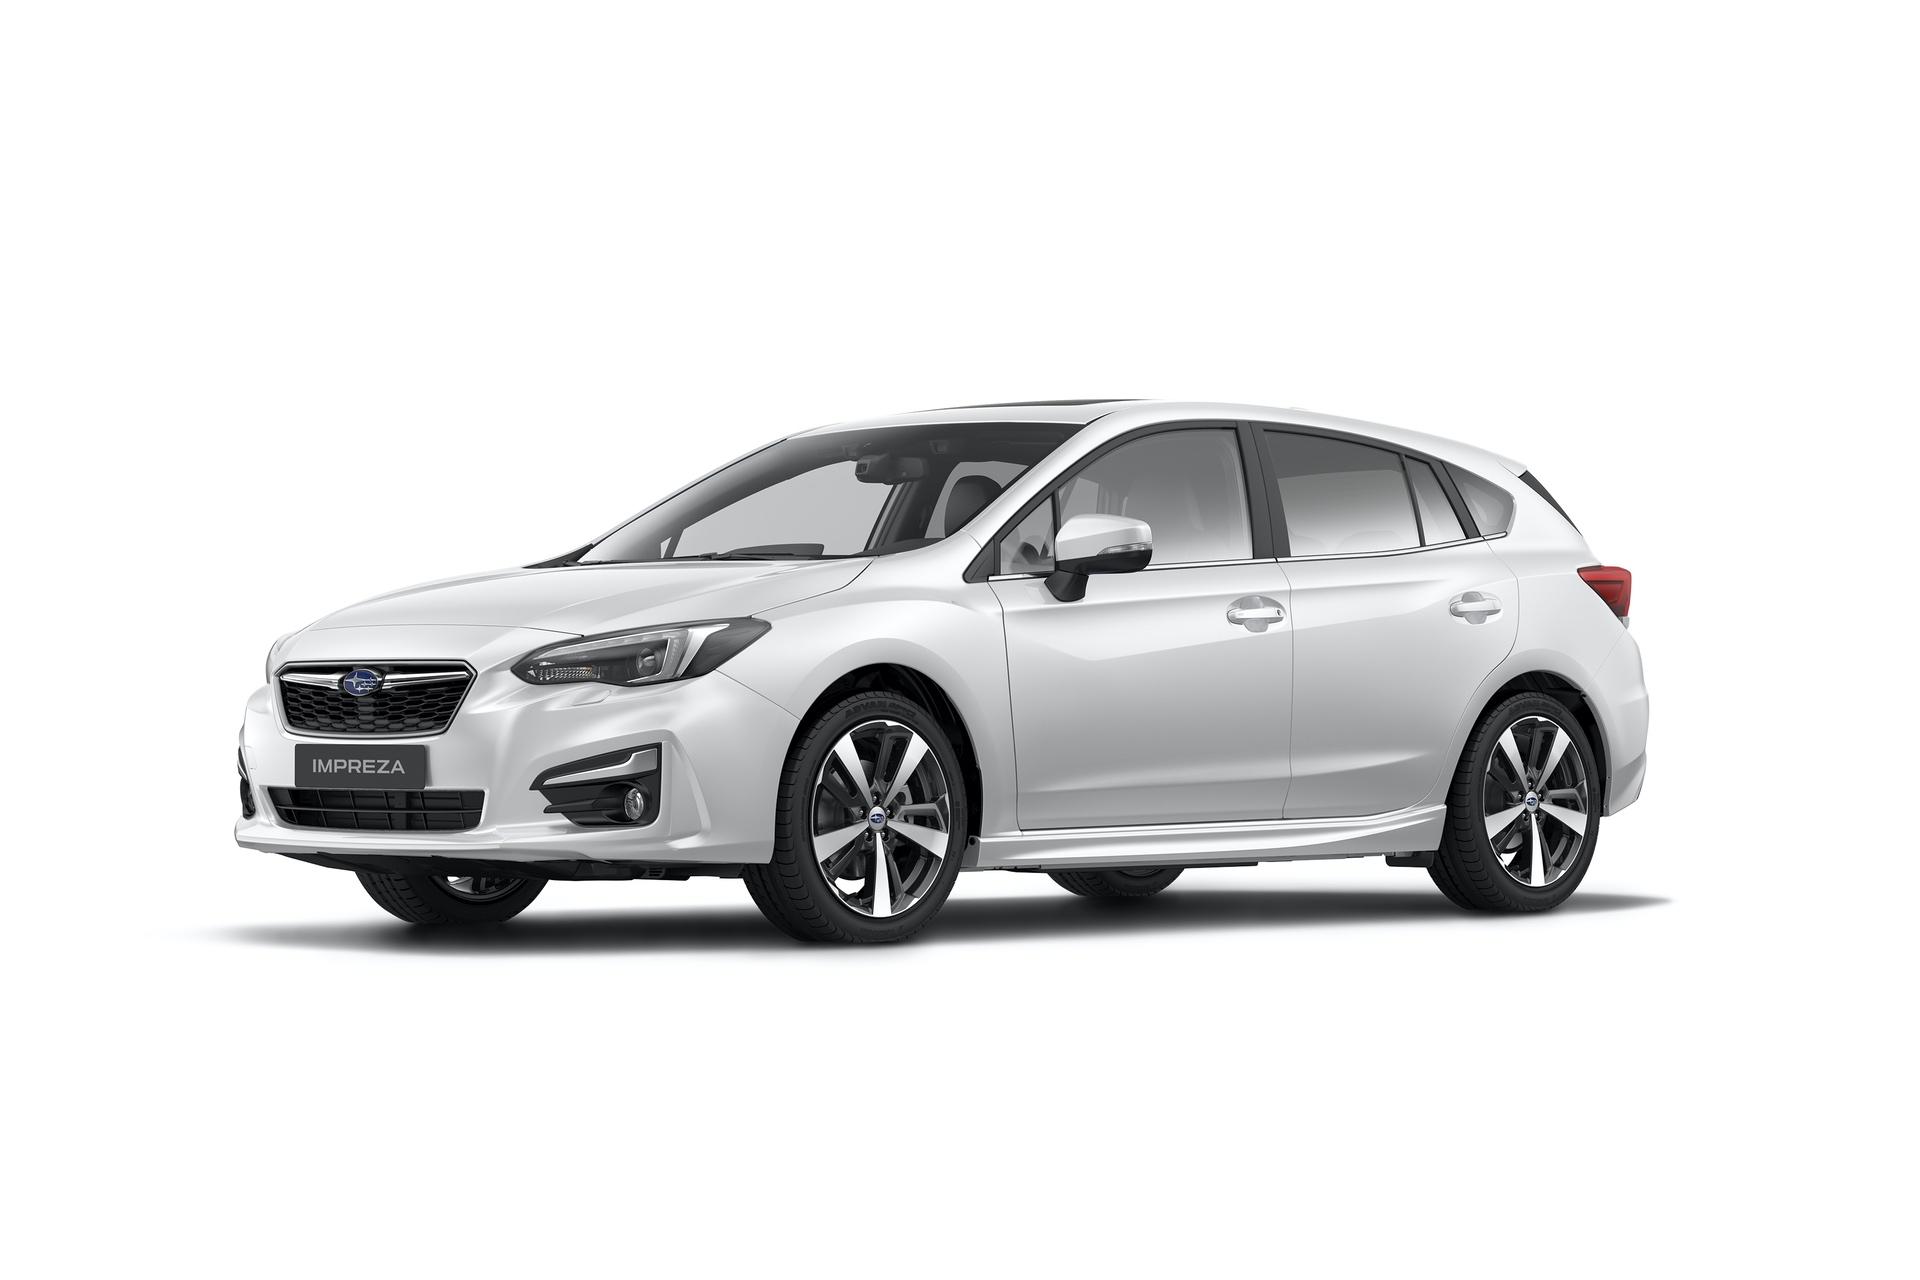 First_Drive_Subaru_Impreza_0010